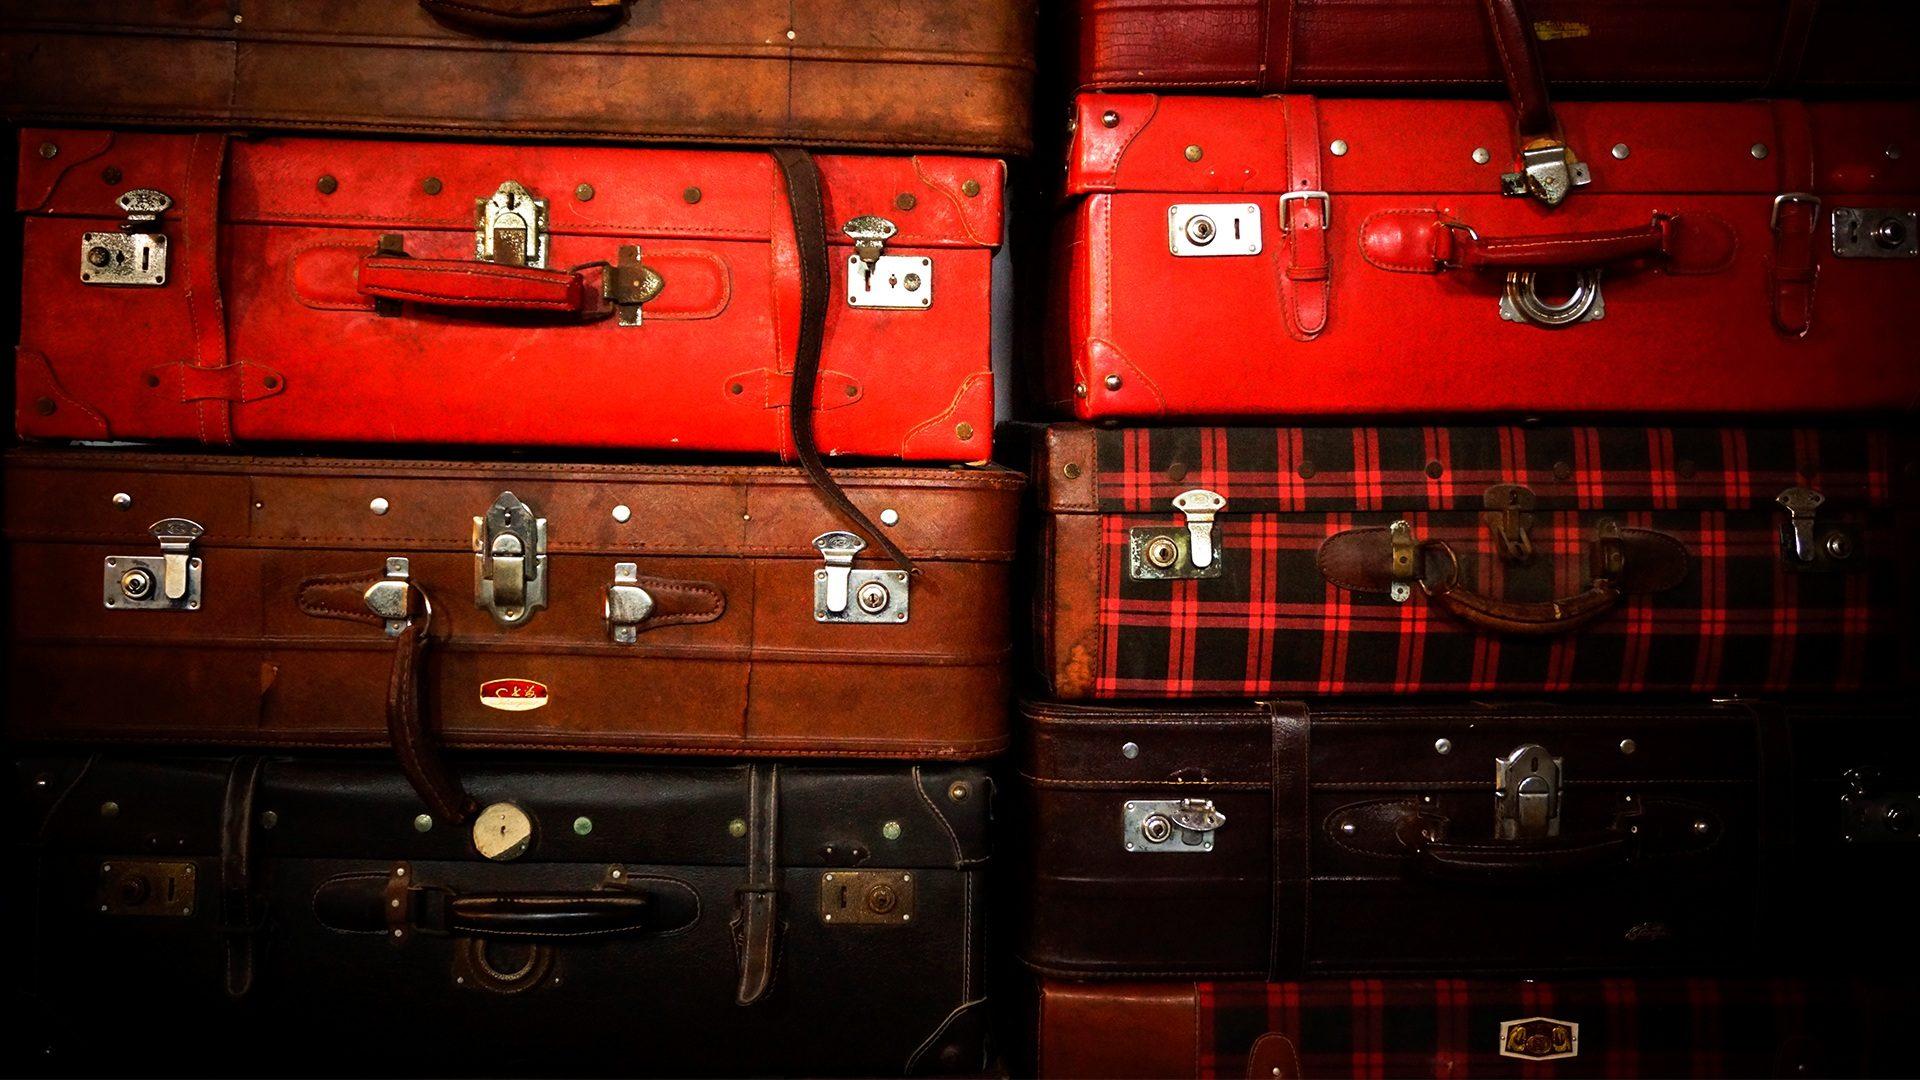 equipaje, maletas, antiguas, vintage, montón, pila - Fondos de Pantalla HD - professor-falken.com